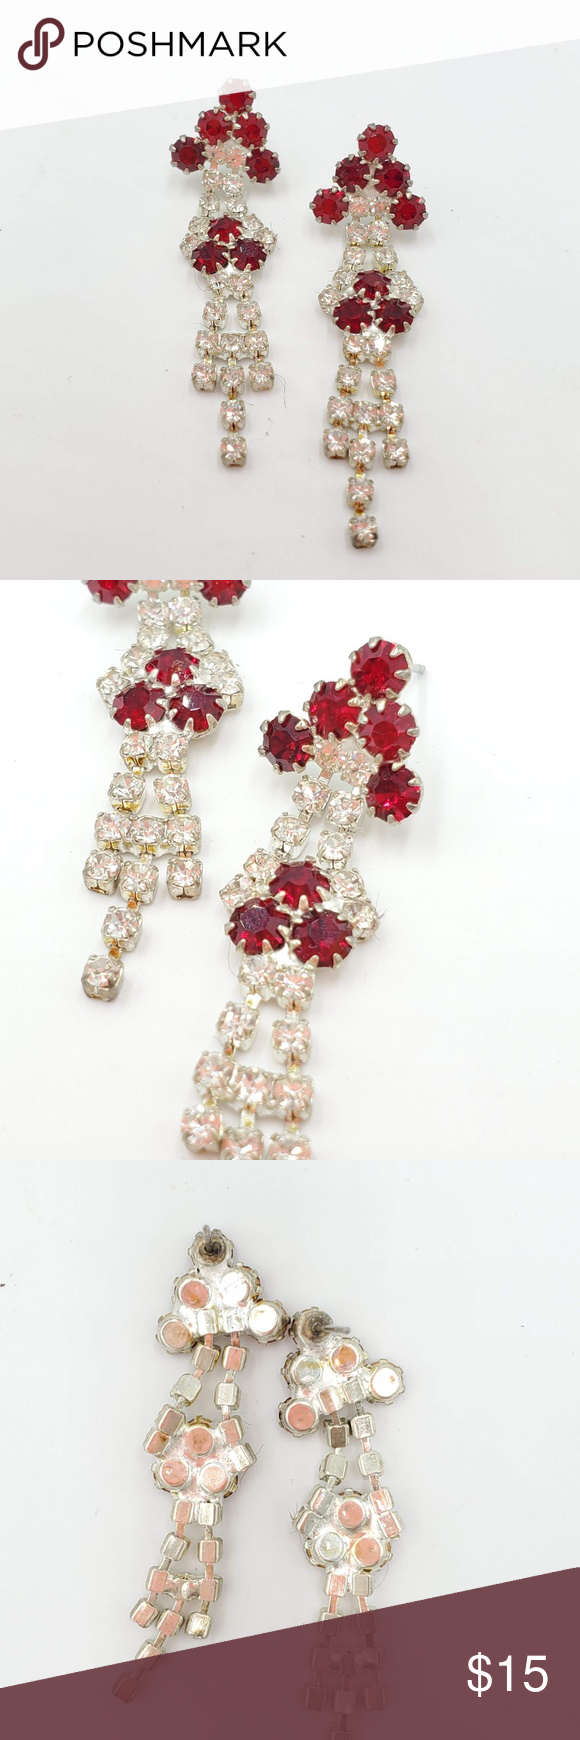 Vintage rhinestone red and white dressy earrings. Dressy